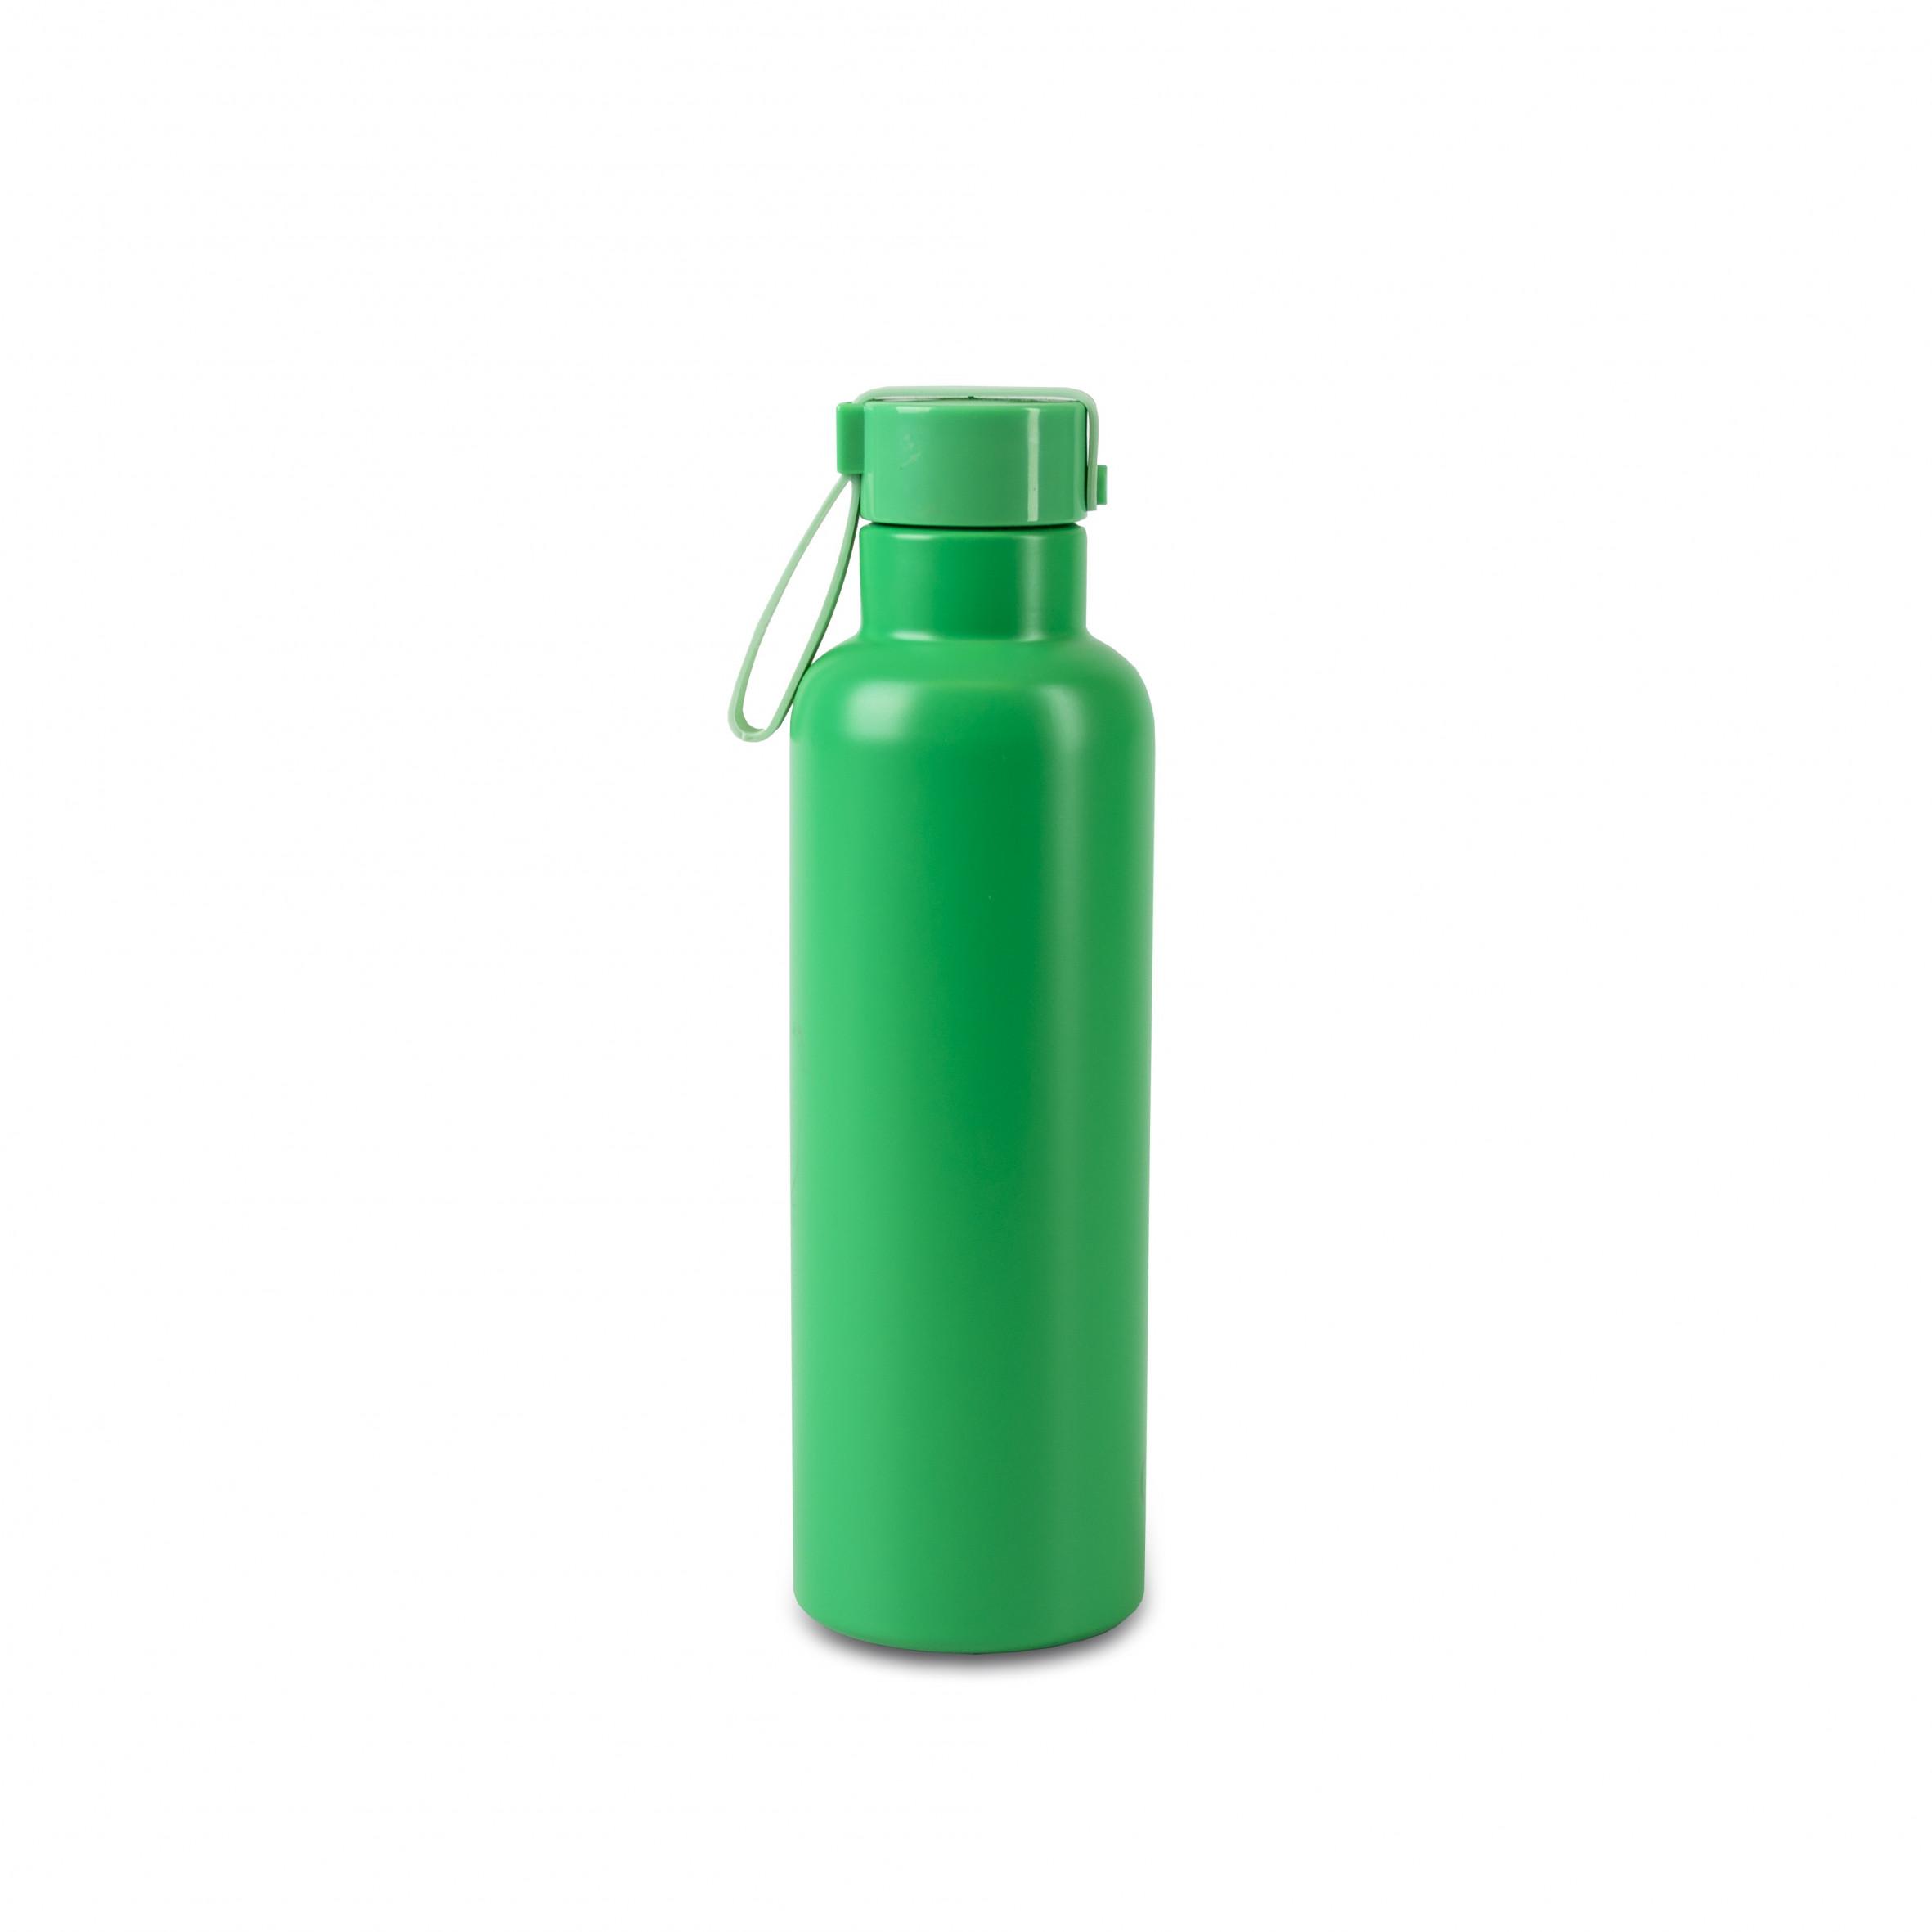 Thermal-Flasche   Grün